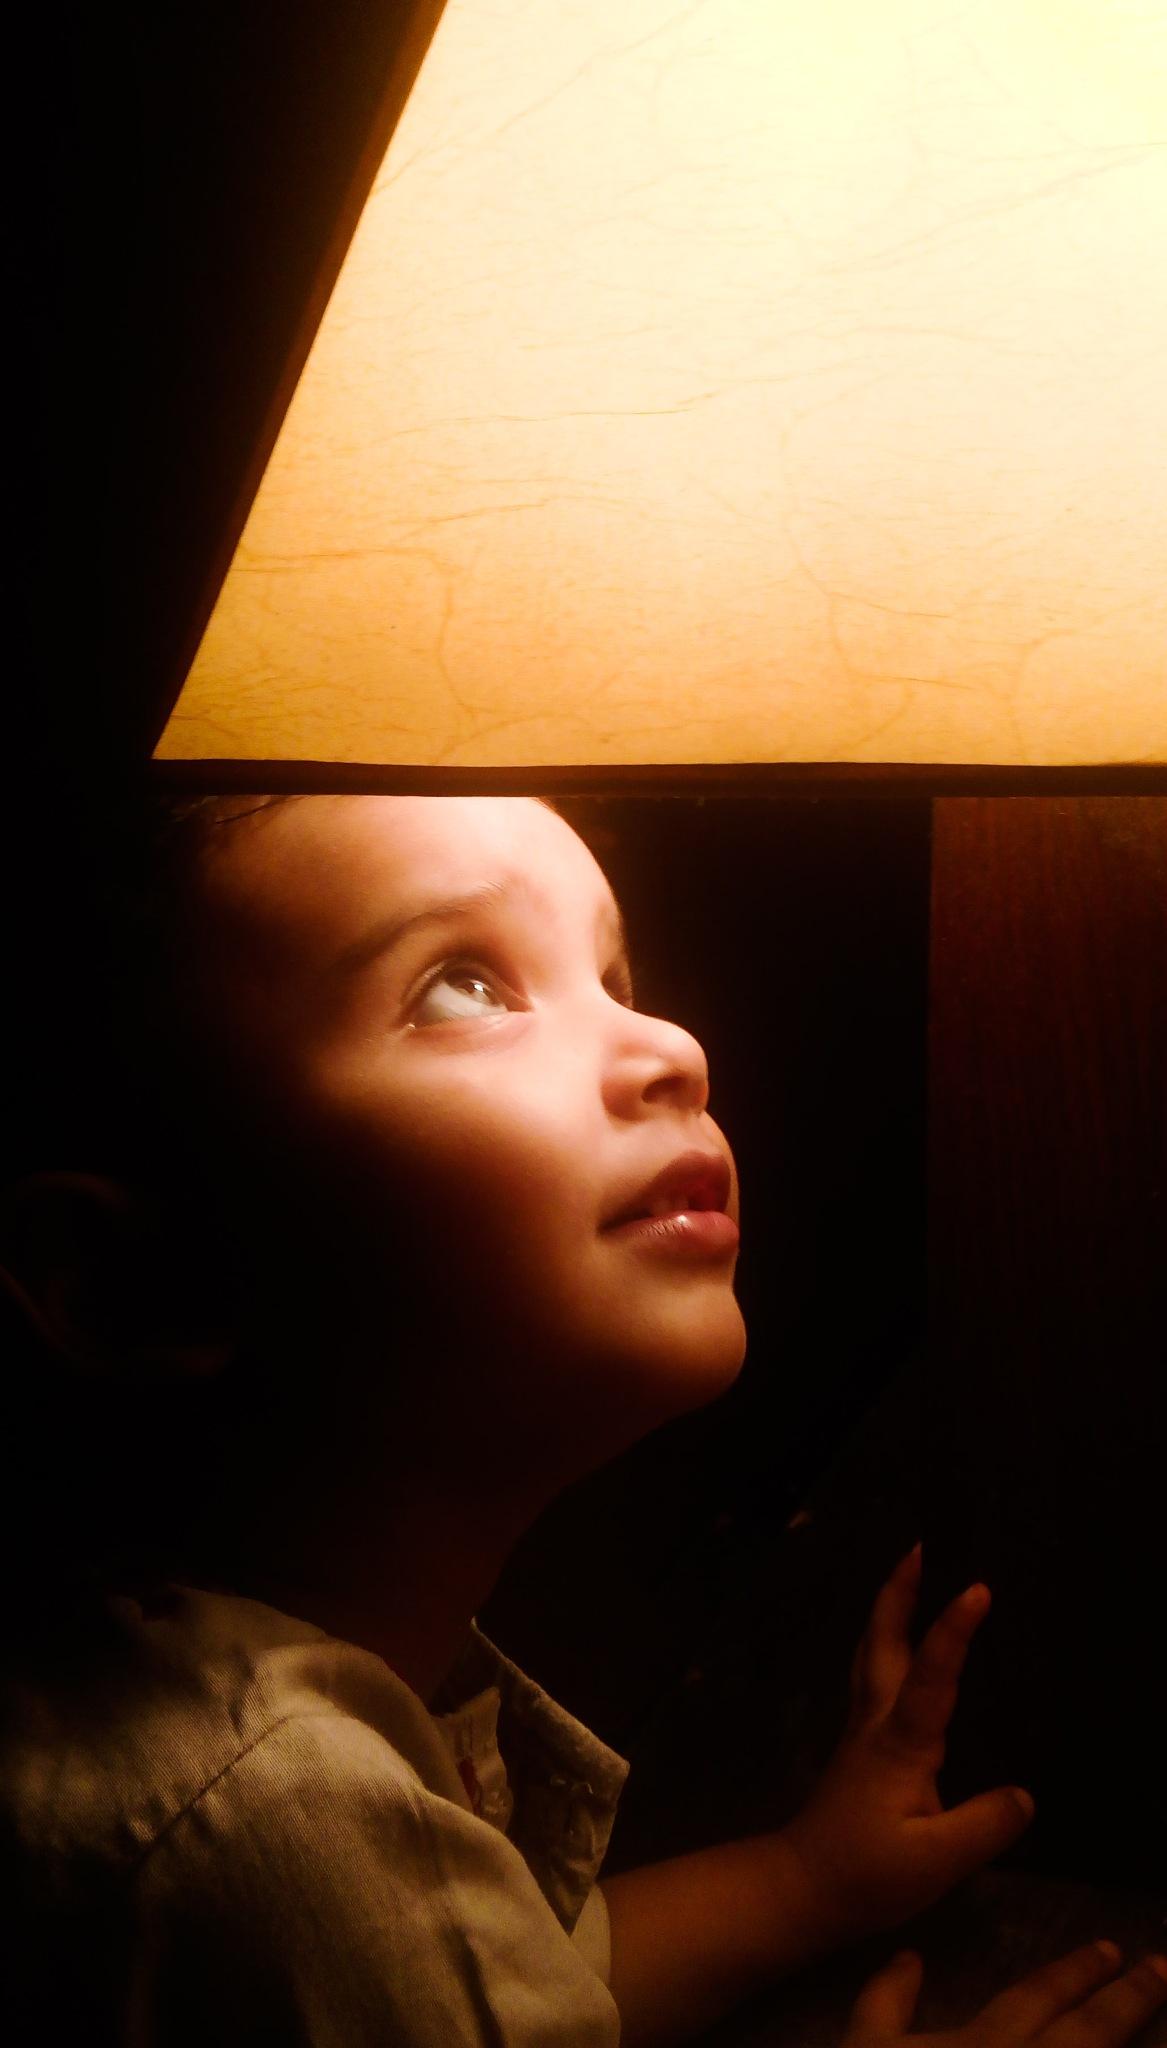 curiosity by Waqar Ghori